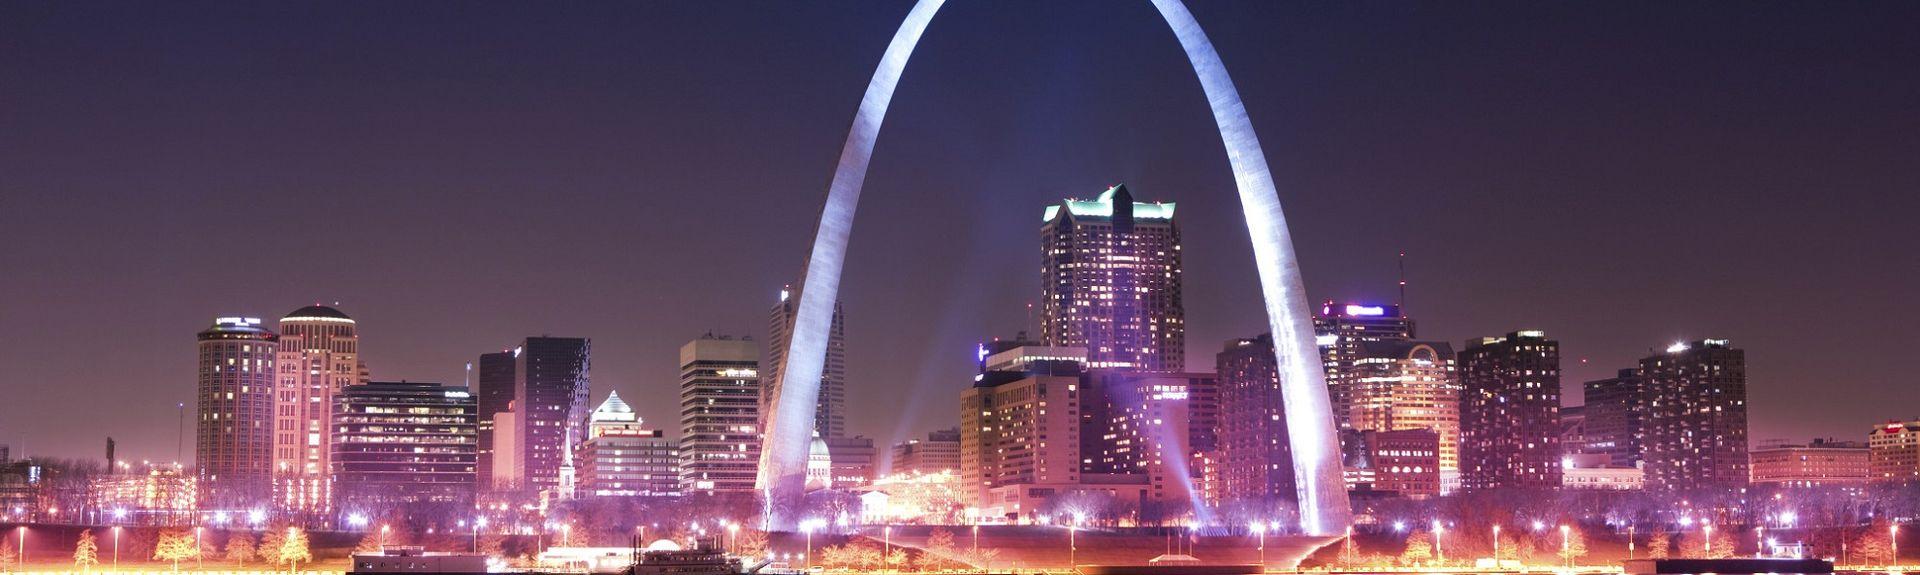 Fenton, Missouri, United States of America